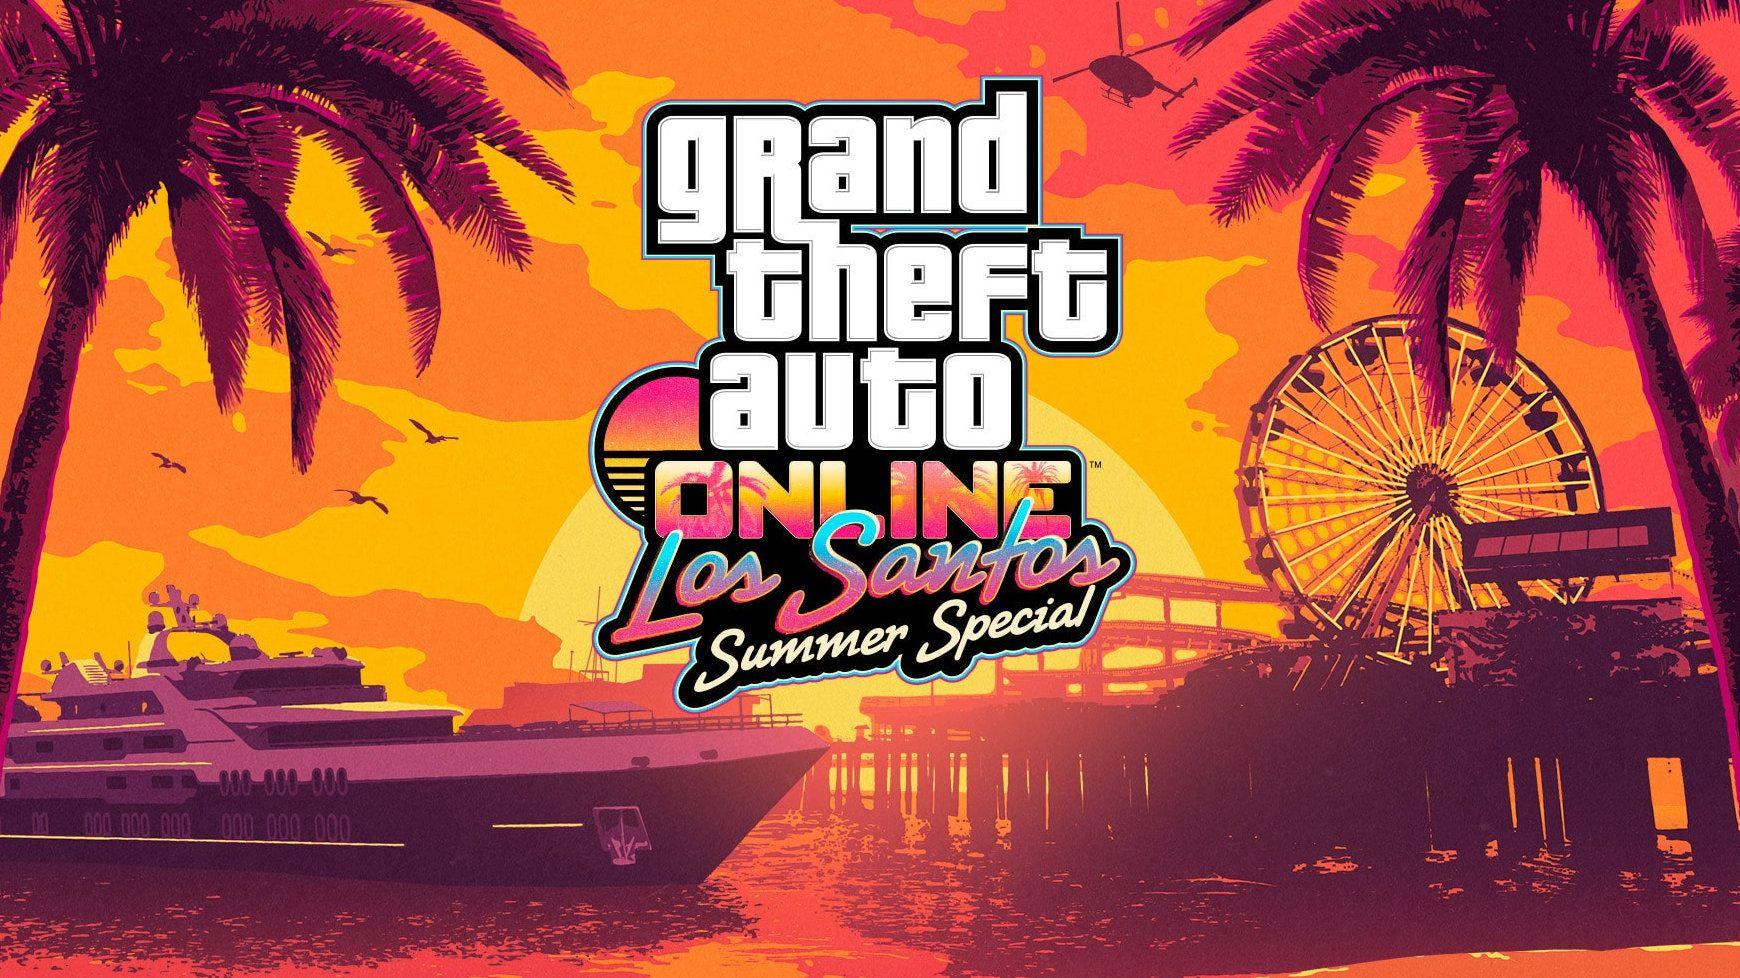 L Update Los Santos Summer Special Est Disponible Dans Gta Online En 2020 Grand Theft Auto Red Dead Redemption San Andreas